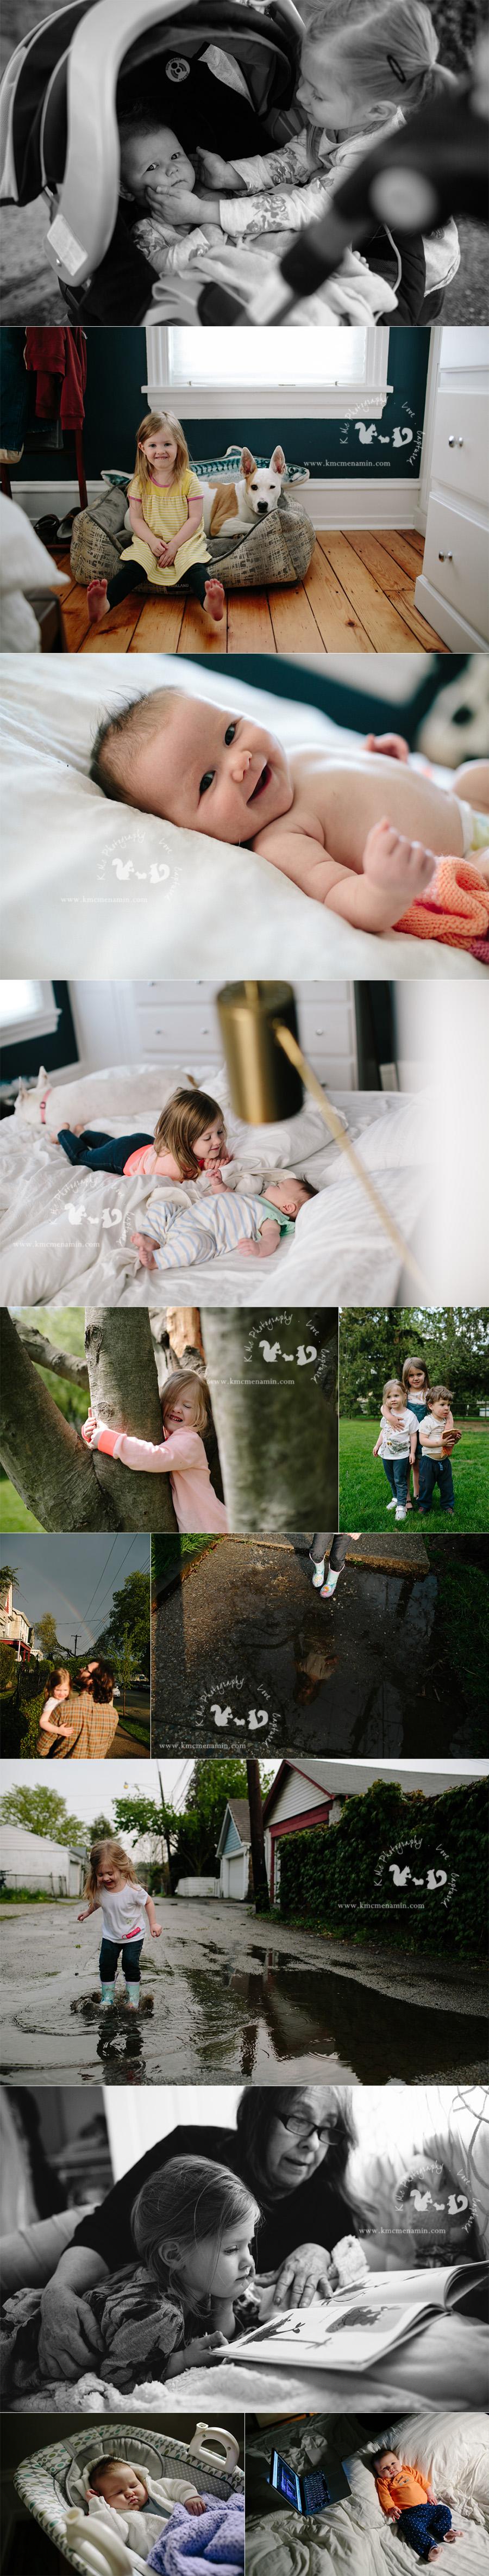 Conshohocken_Family_Photographer_6